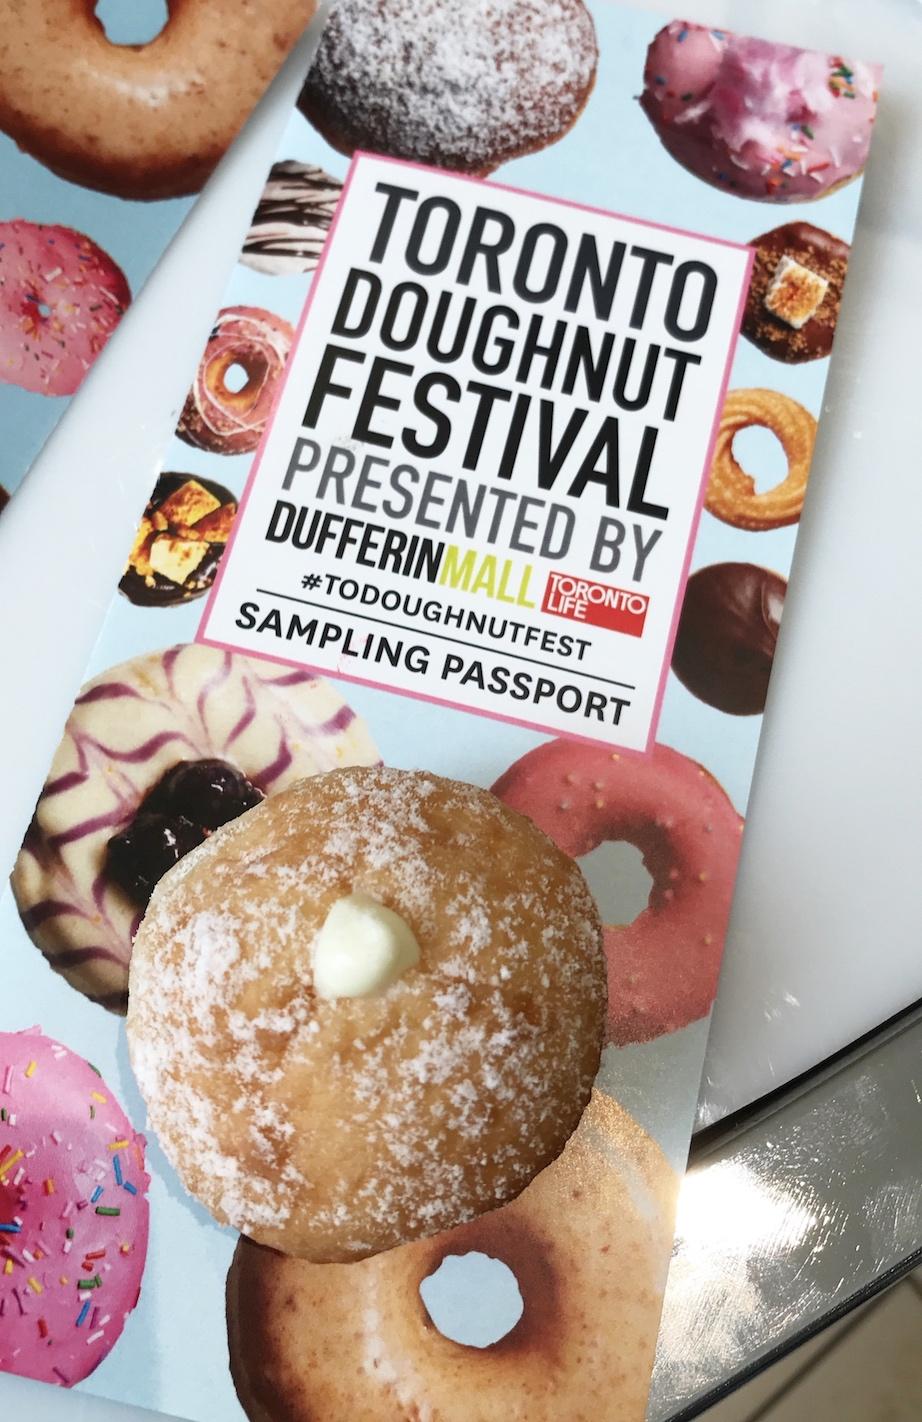 toronto-life-doughnut-festival-2018-dufferin-mall-cheese-boutique.JPG